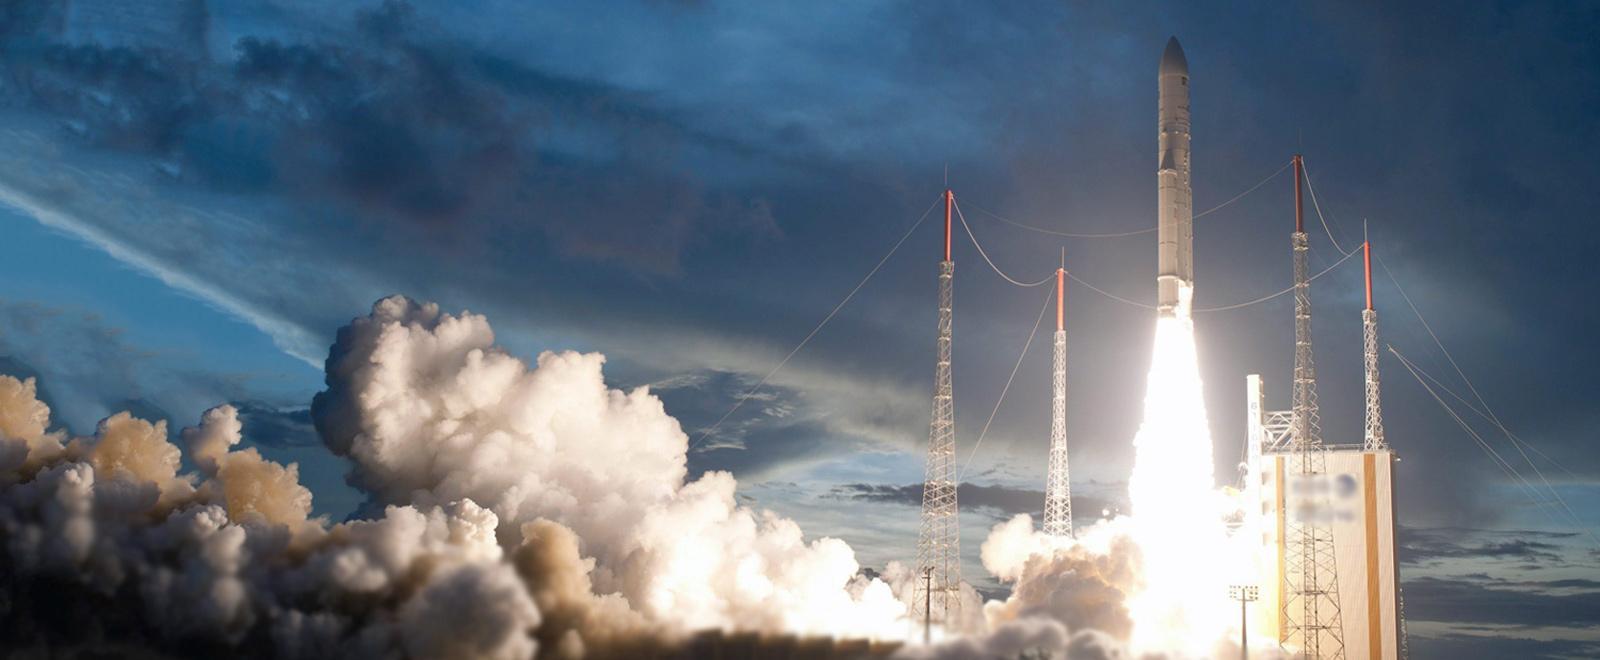 Ariane 5: storia di un successo